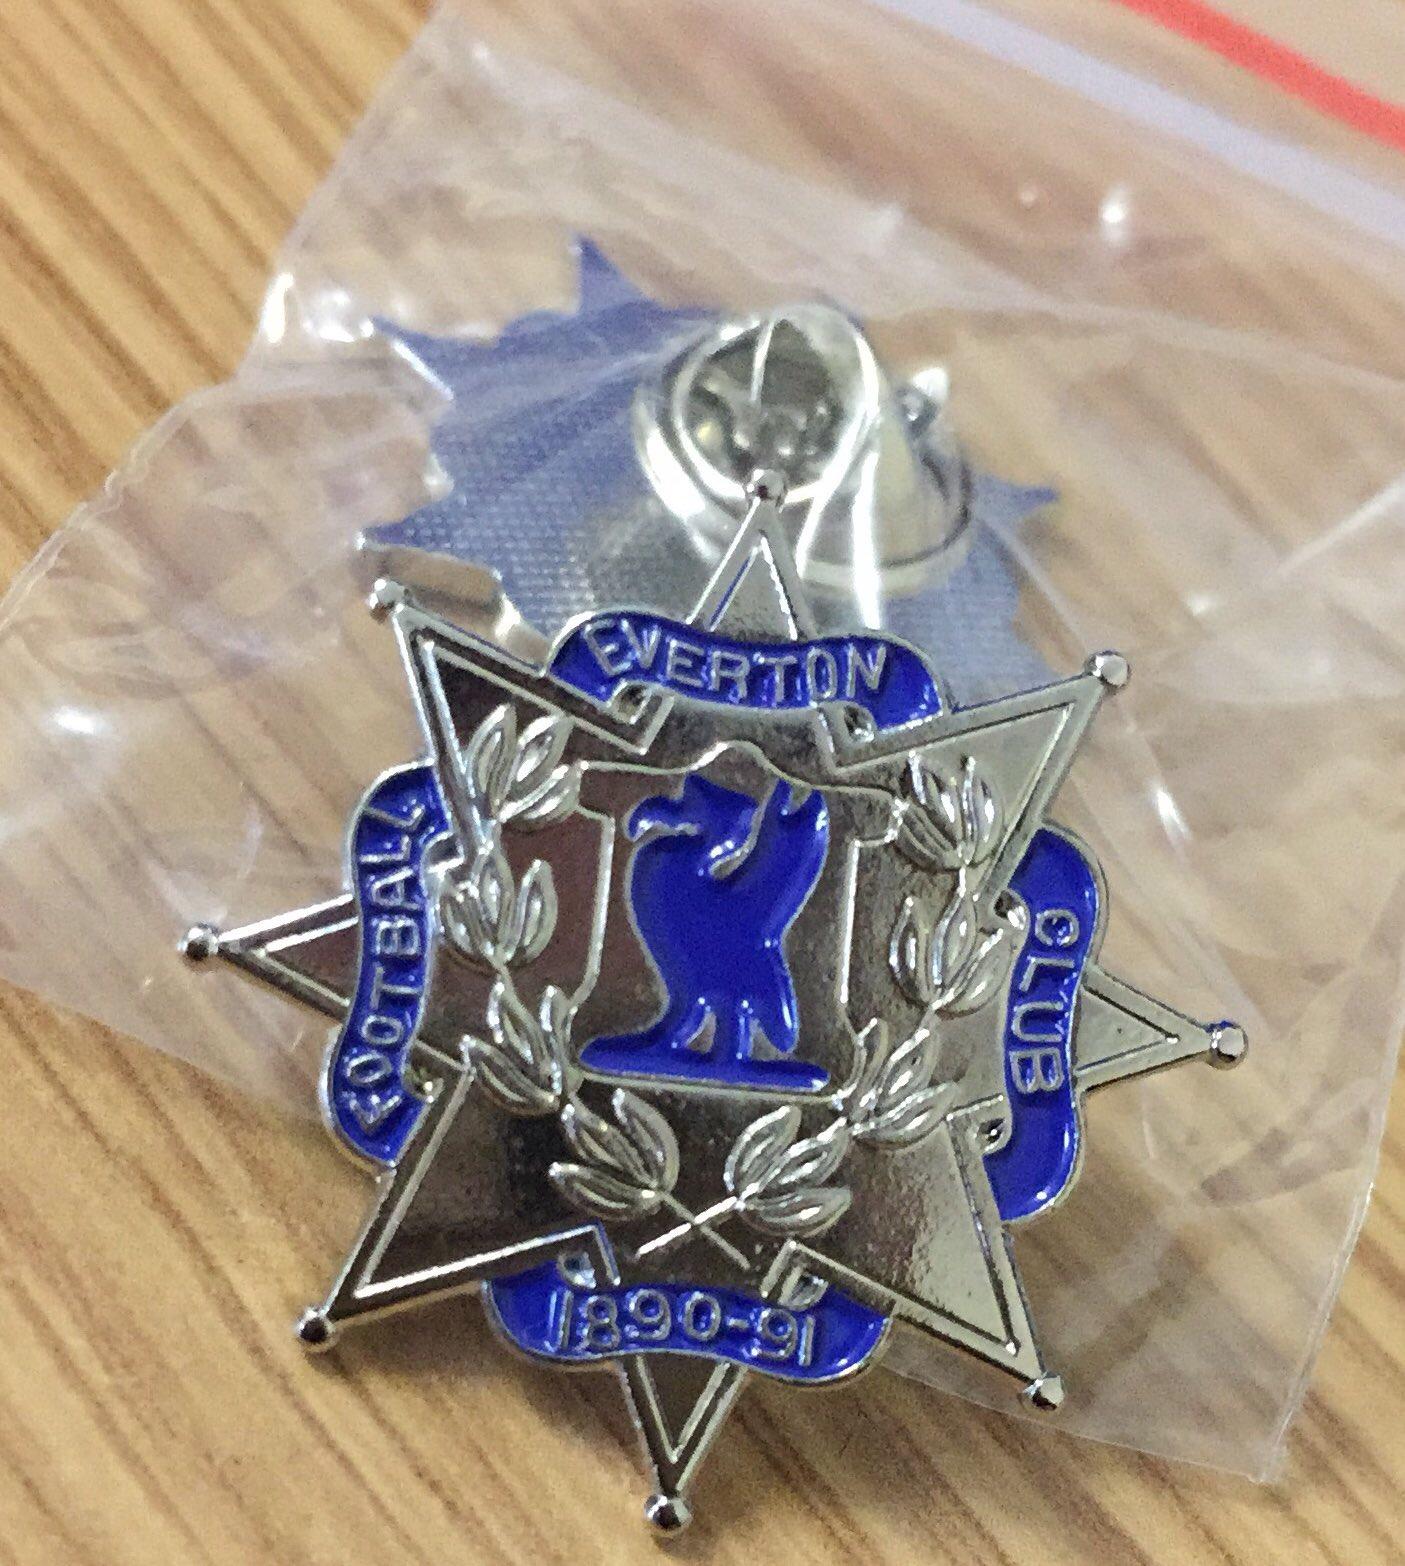 League Champions 1890 91 Enamel Pin Badge Toffee Art